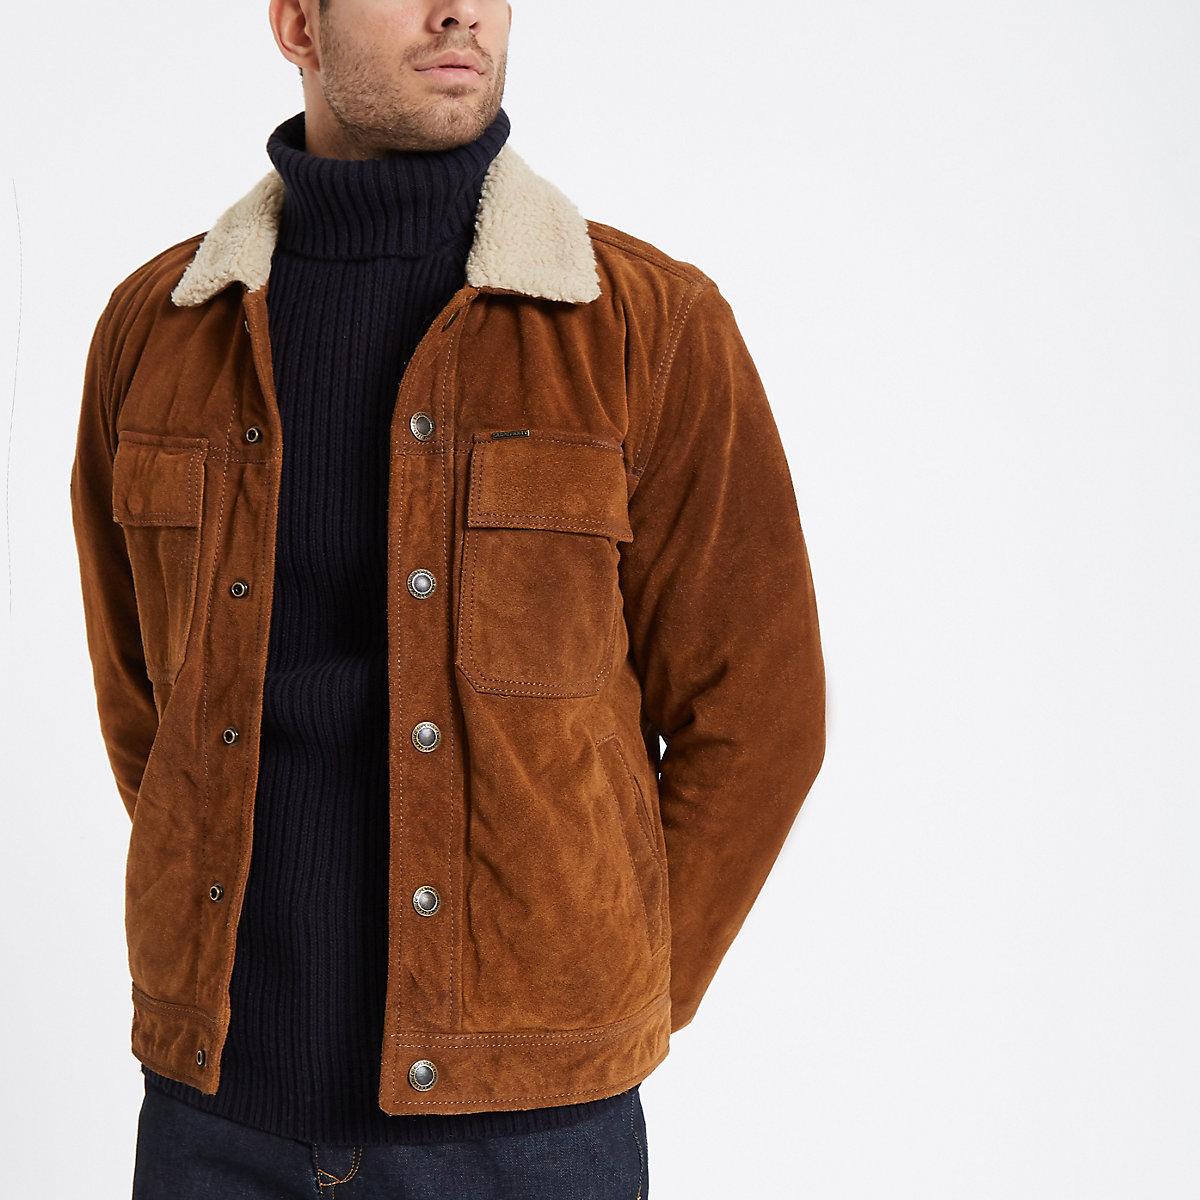 Superdry tan suede fleece collar jacket